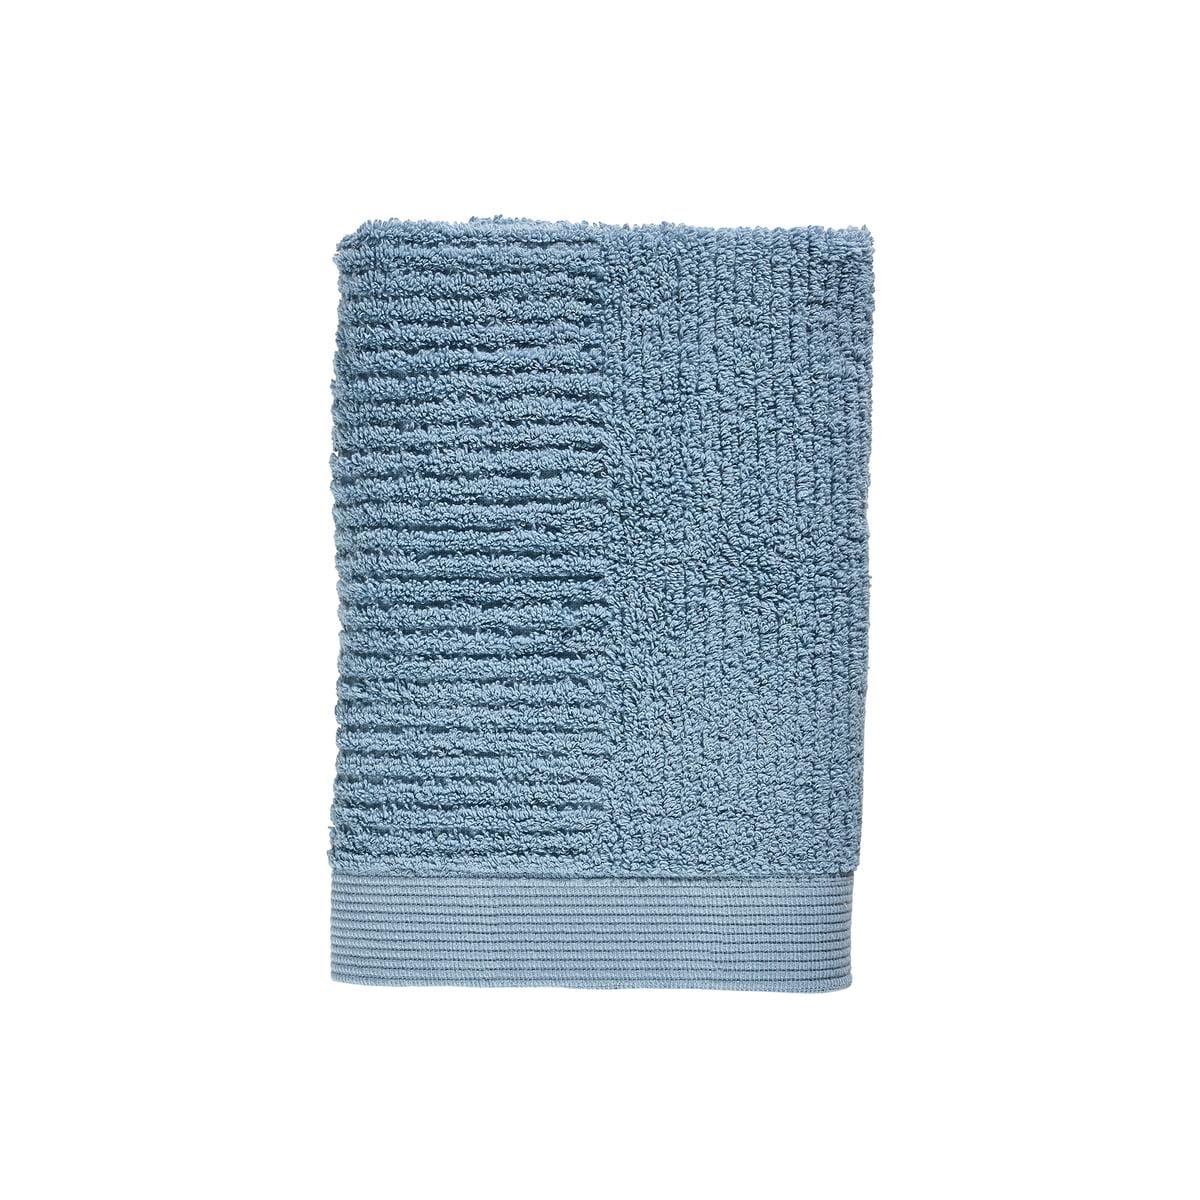 Zone Denmark - Classic Gästehandtuch, 50 x 70 cm, blue fog | Bad > Handtücher > Gästehandtücher | Zone Denmark